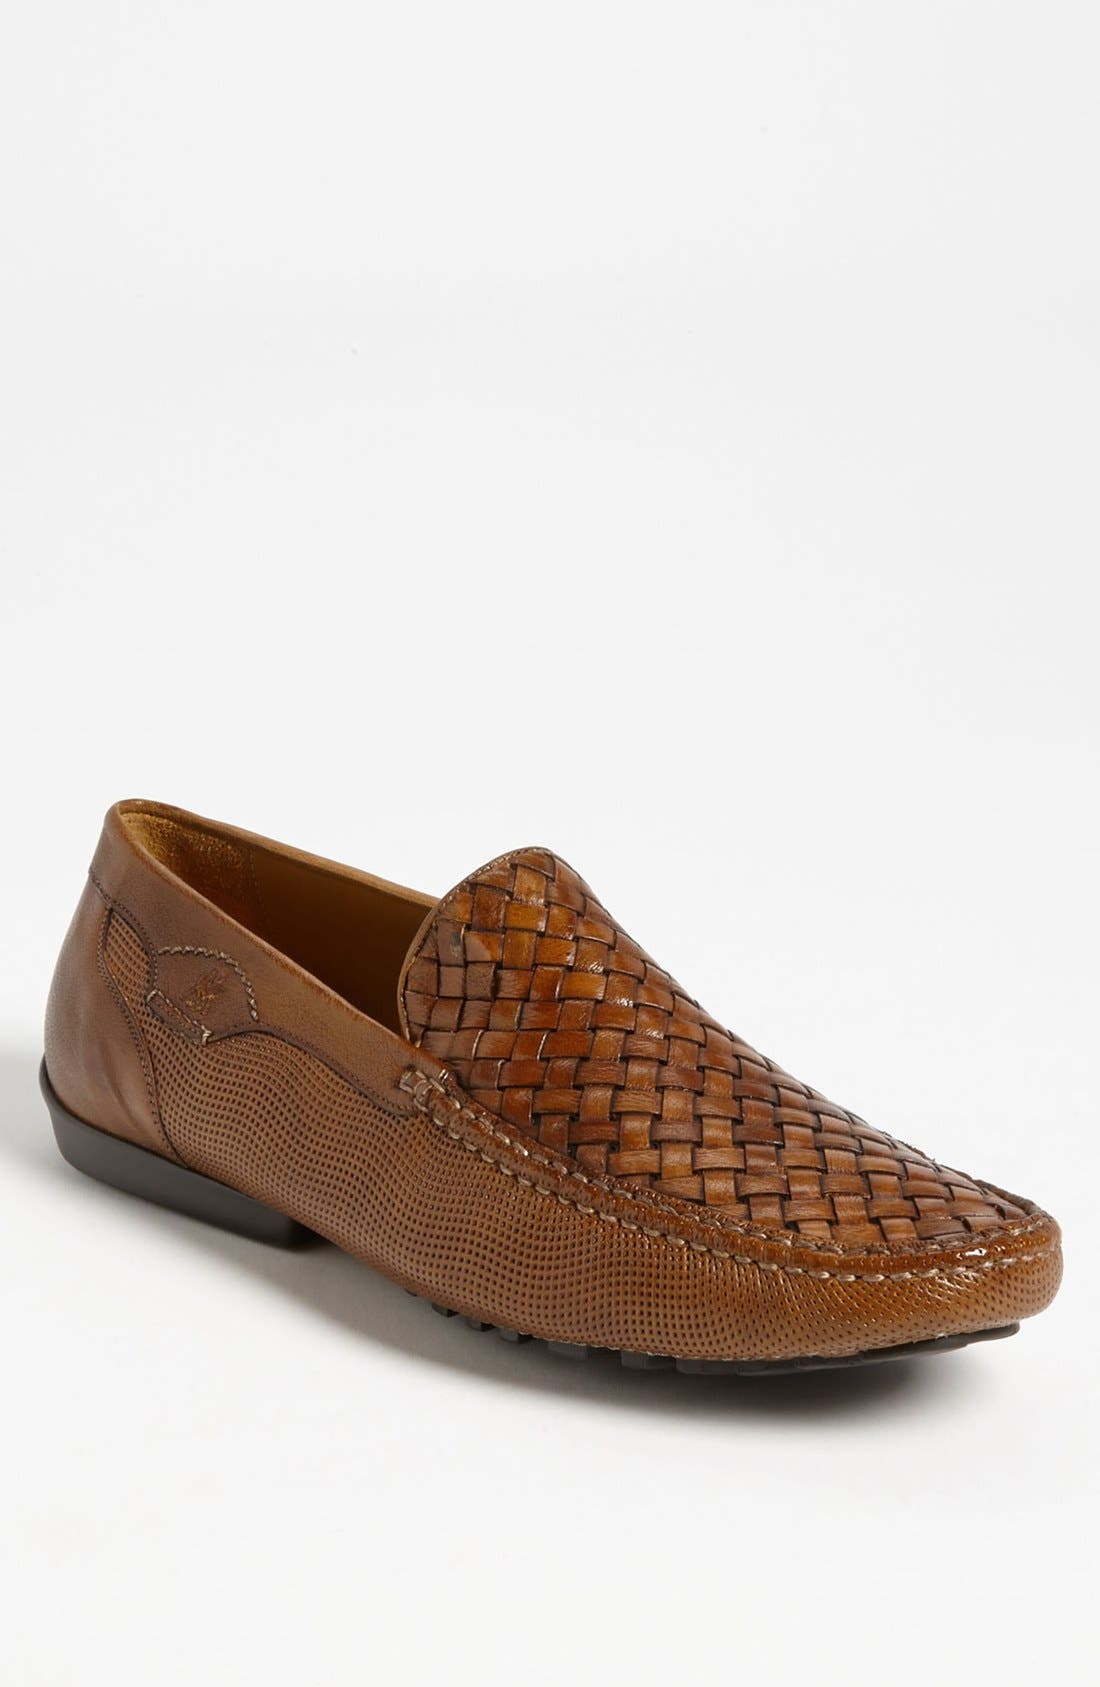 Main Image - Mezlan 'Naldo' Woven Driving Shoe